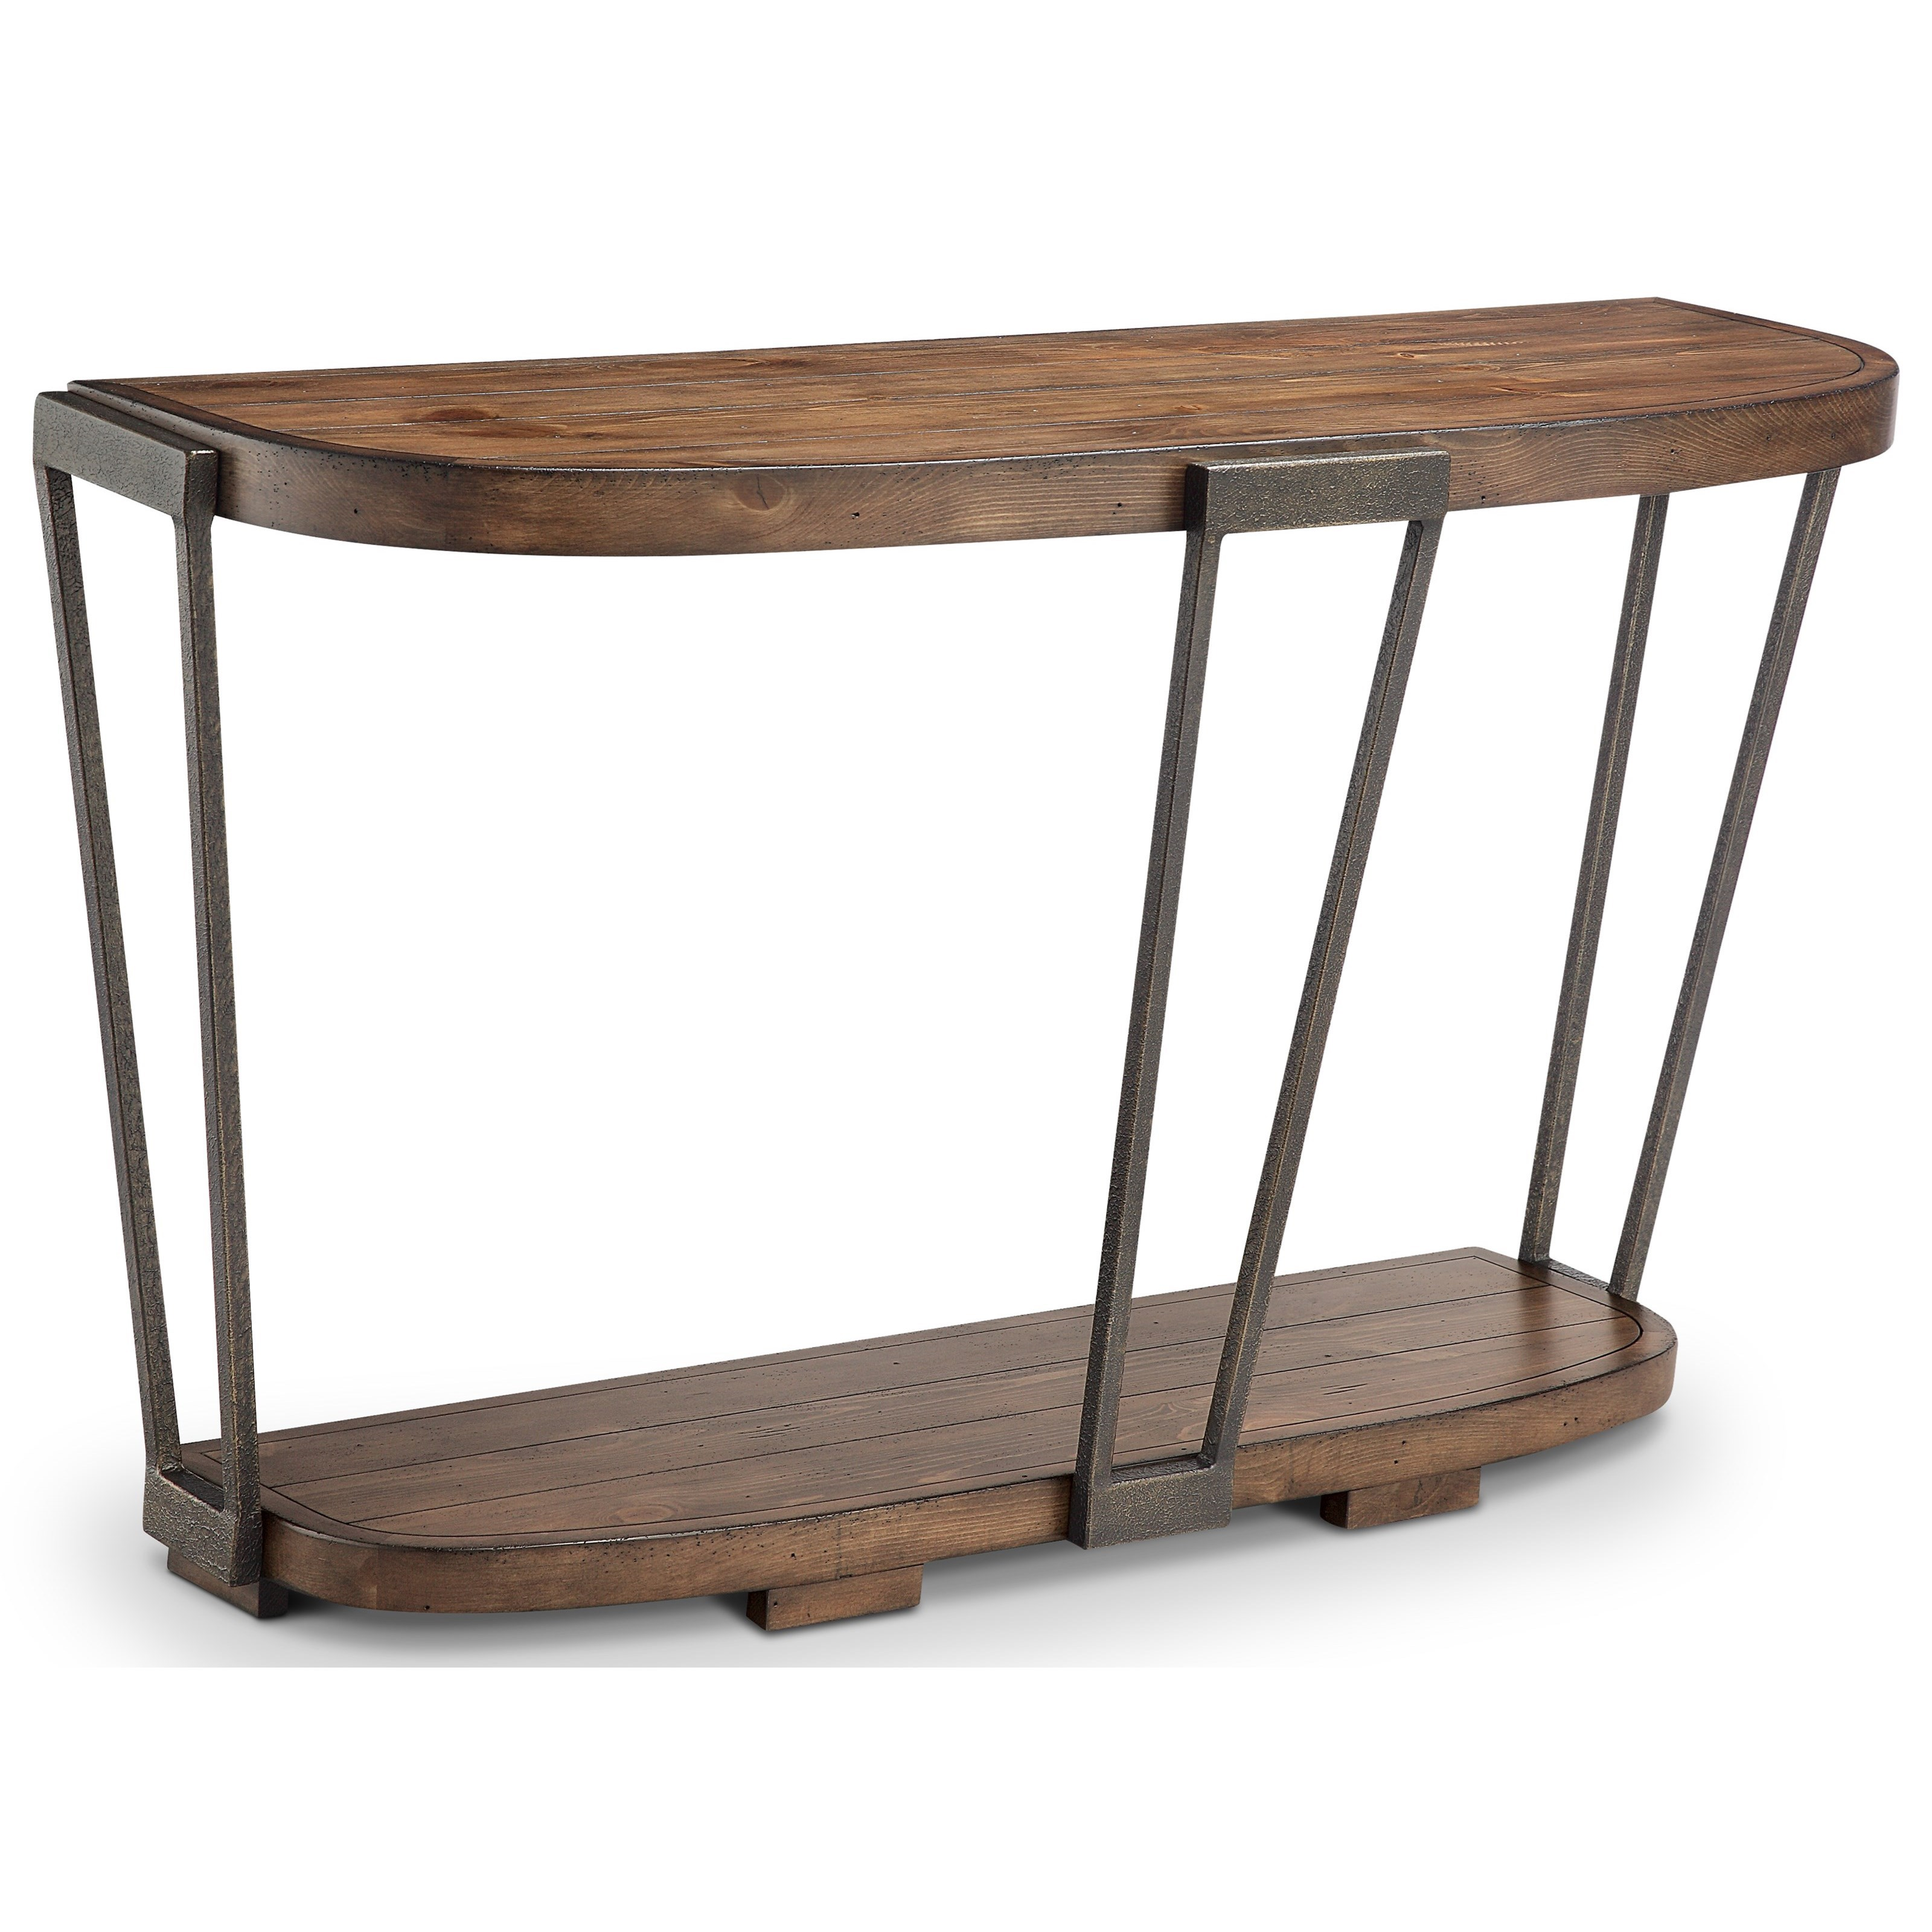 Demilune Sofa Table with 1 Bottom Shelf